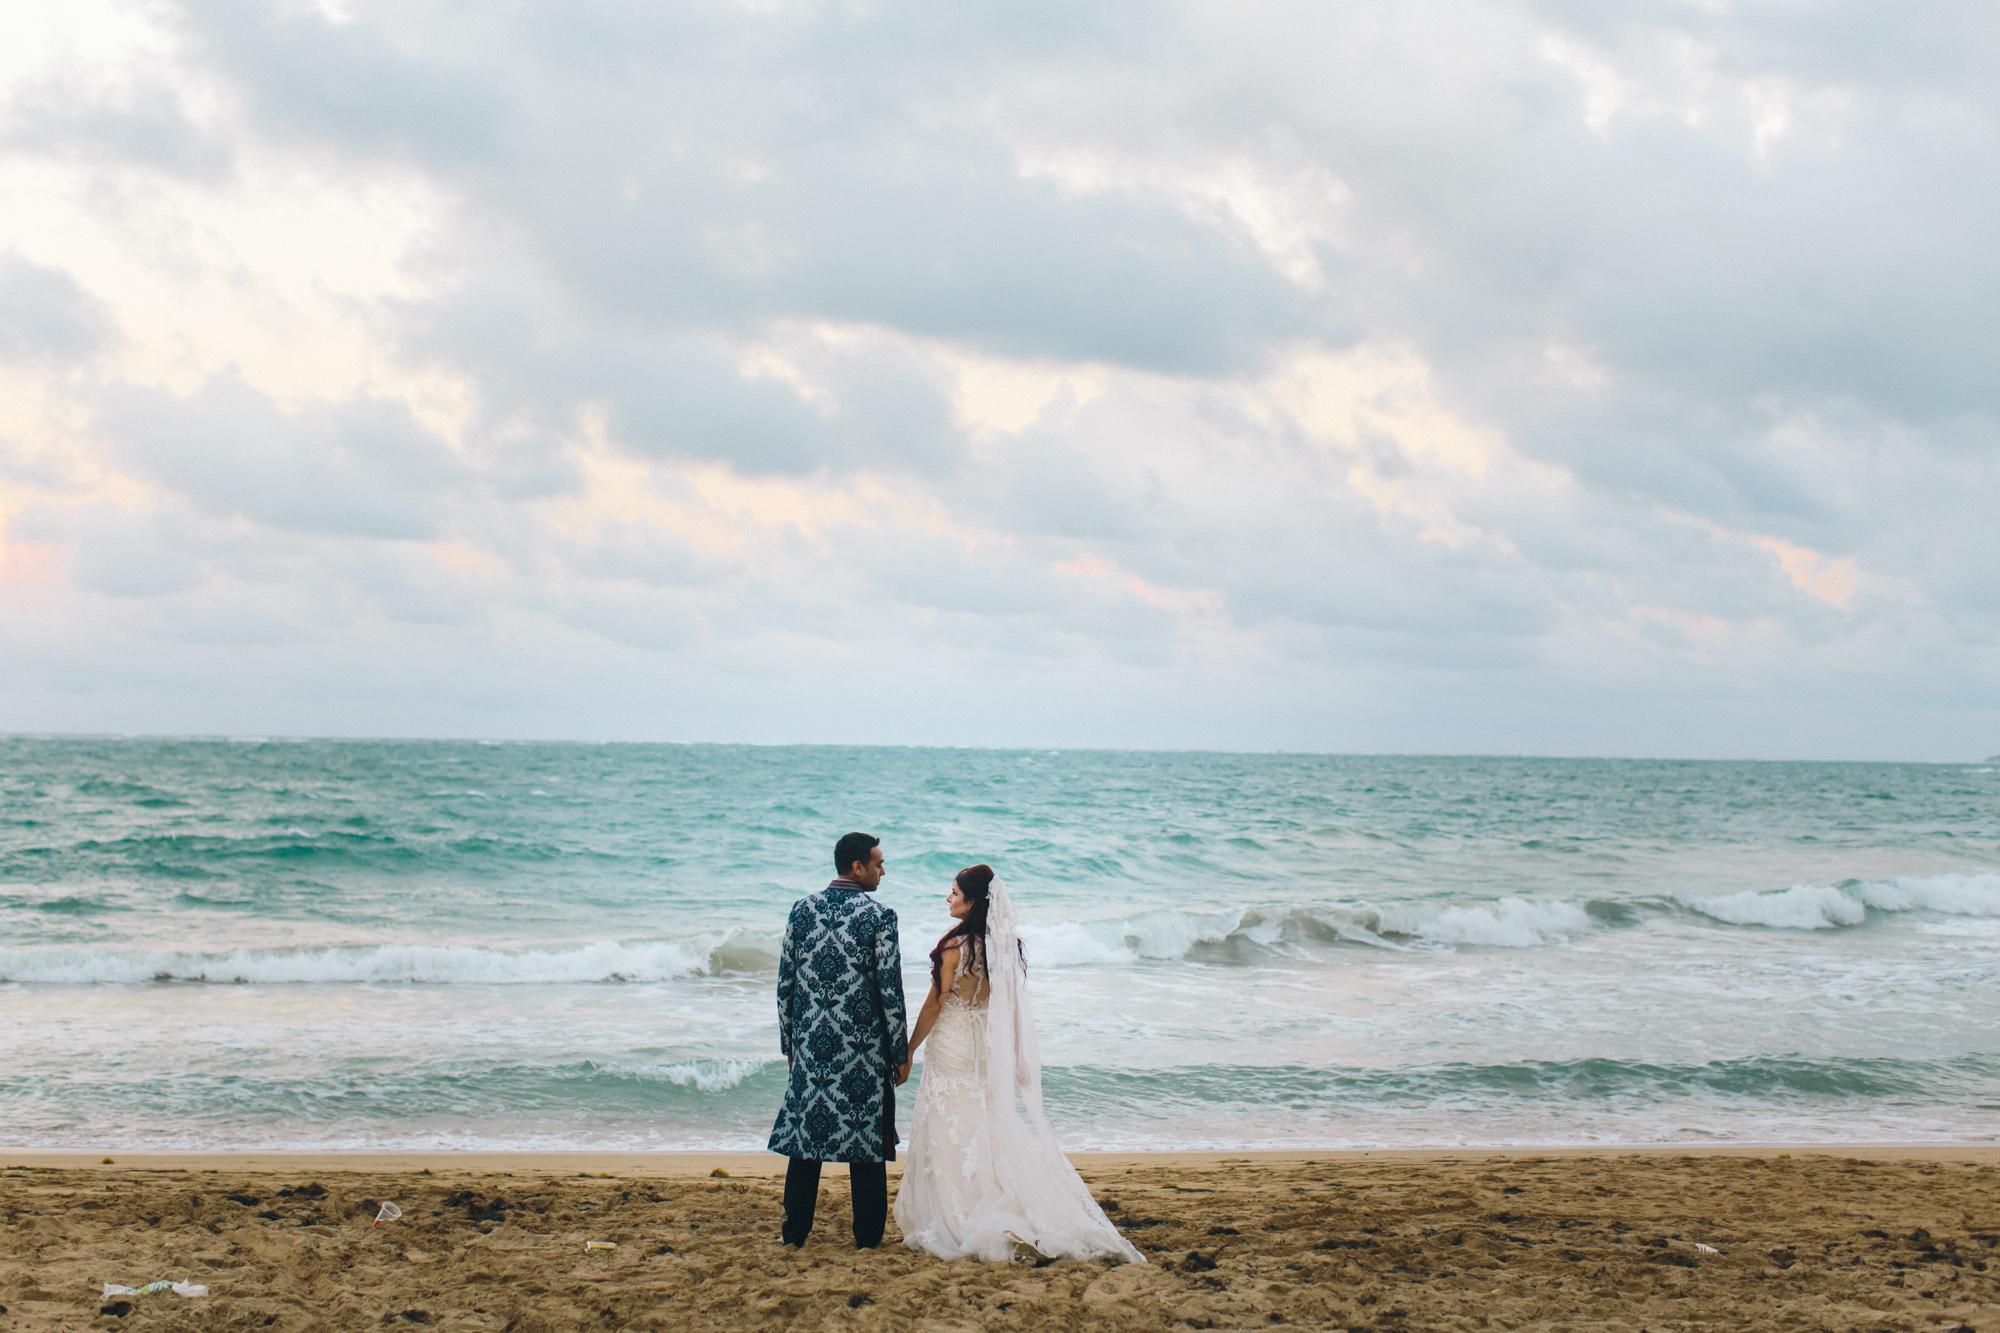 Puerto Rico Wedding Photography Destination Photographer Boris Zaretsky San Juan PR Casino Antiguo La Concha IMG_0590.jpg